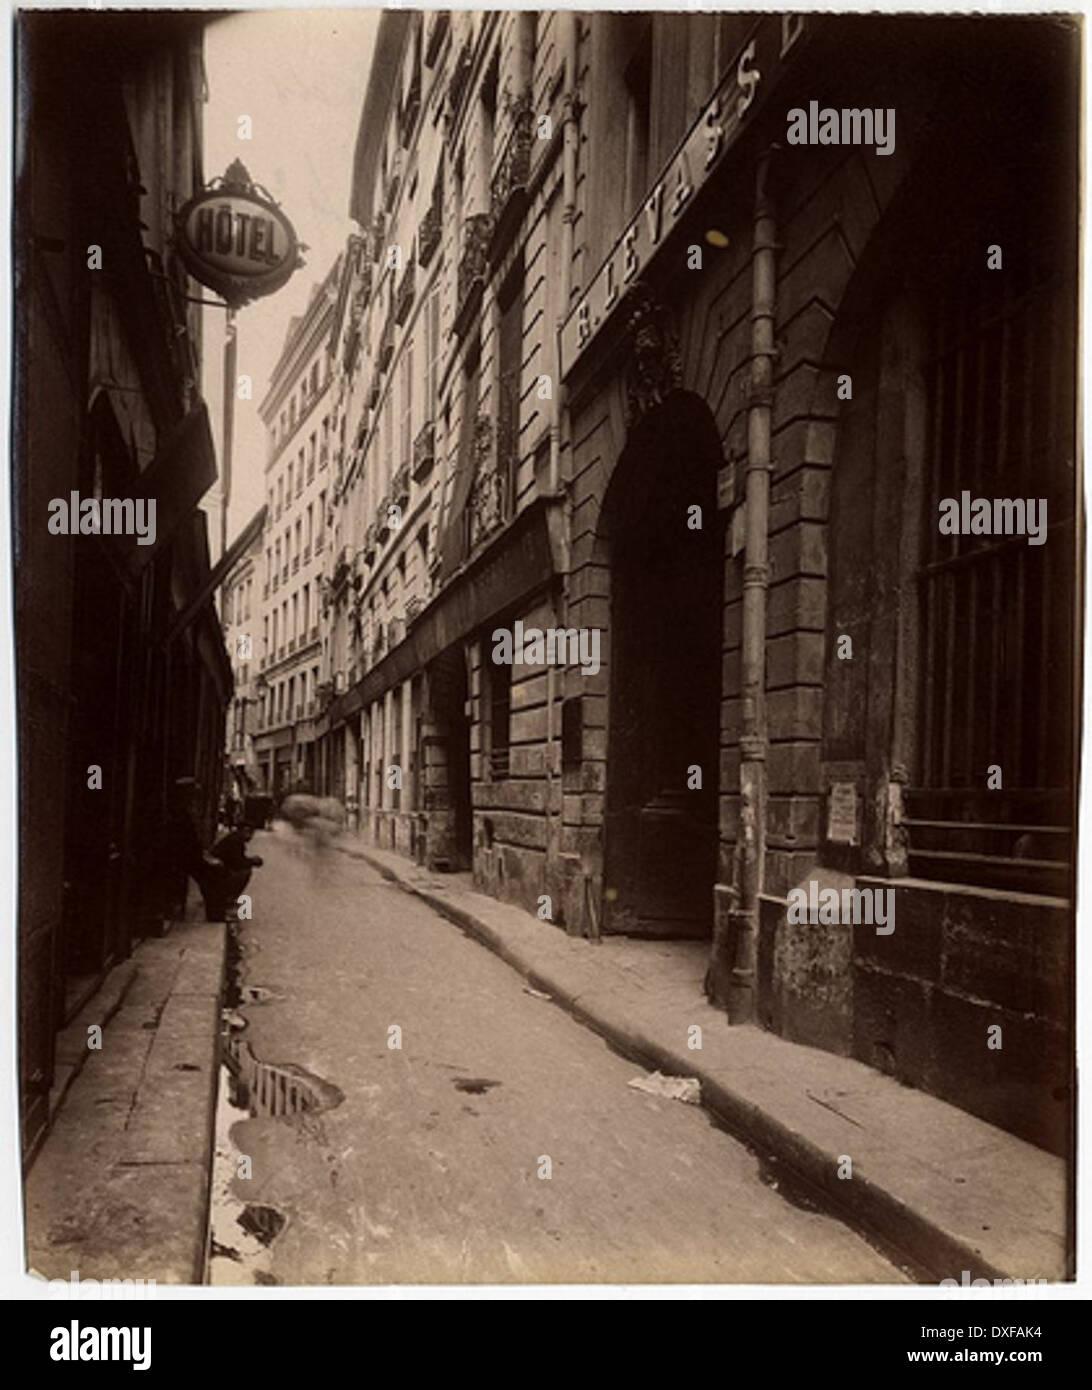 Le Rue Quincampoix - Vue prise de la Rue des Lombards (4e) Le Rue Quincampoix - Vue prise de la Rue des Lombards (4e) - Stock Image